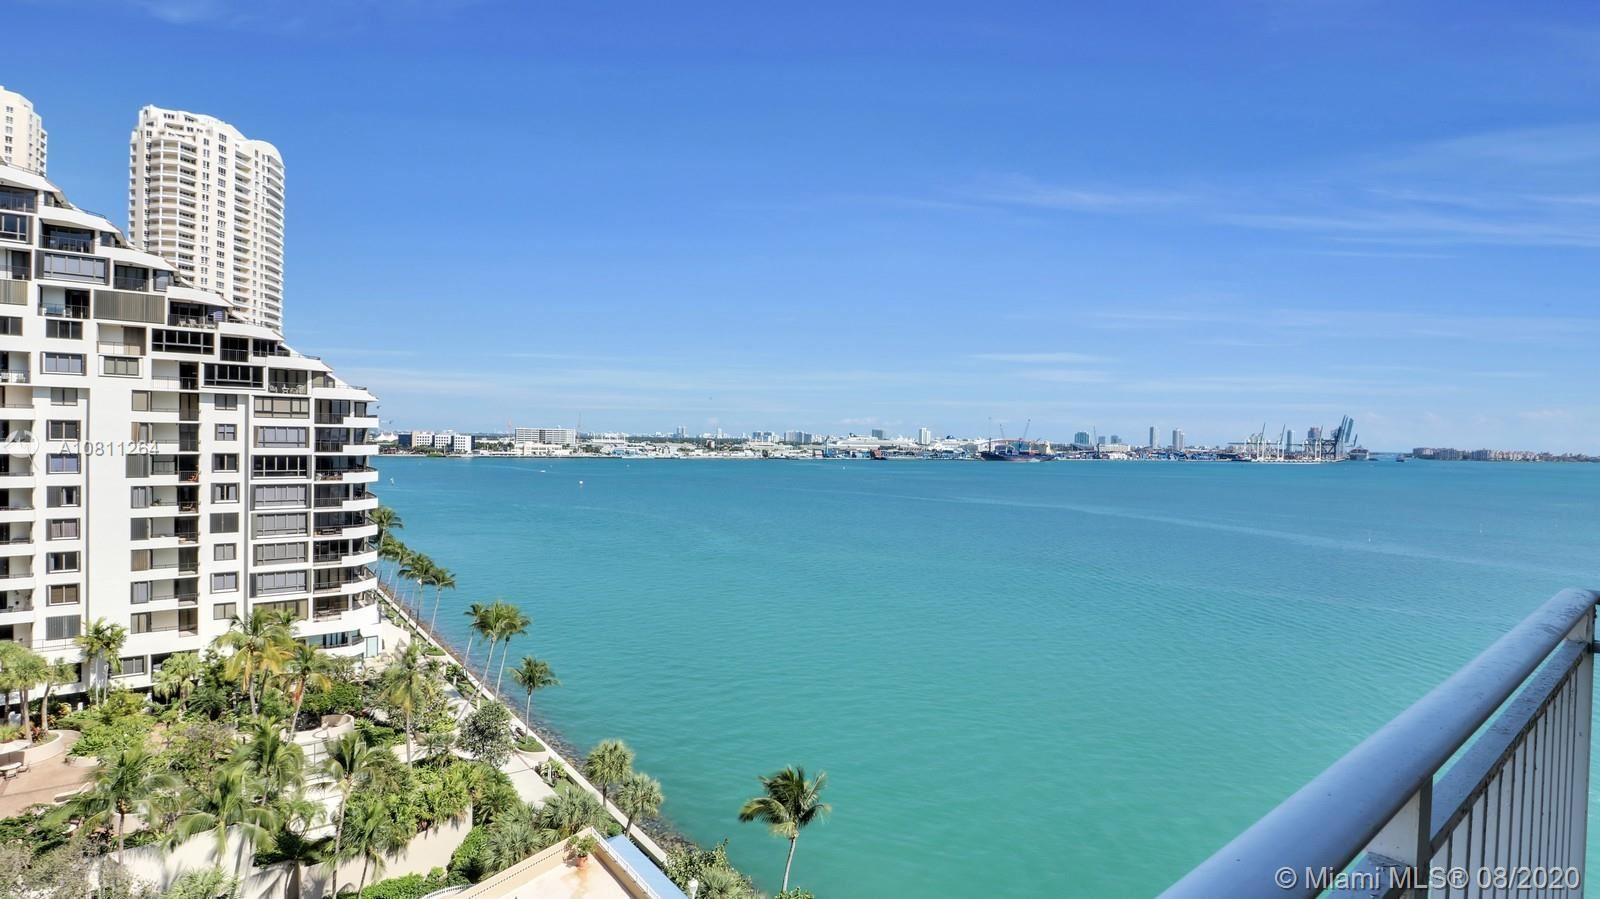 770 Claughton Island Dr #1213, Miami, FL 33131 - #: A10811264